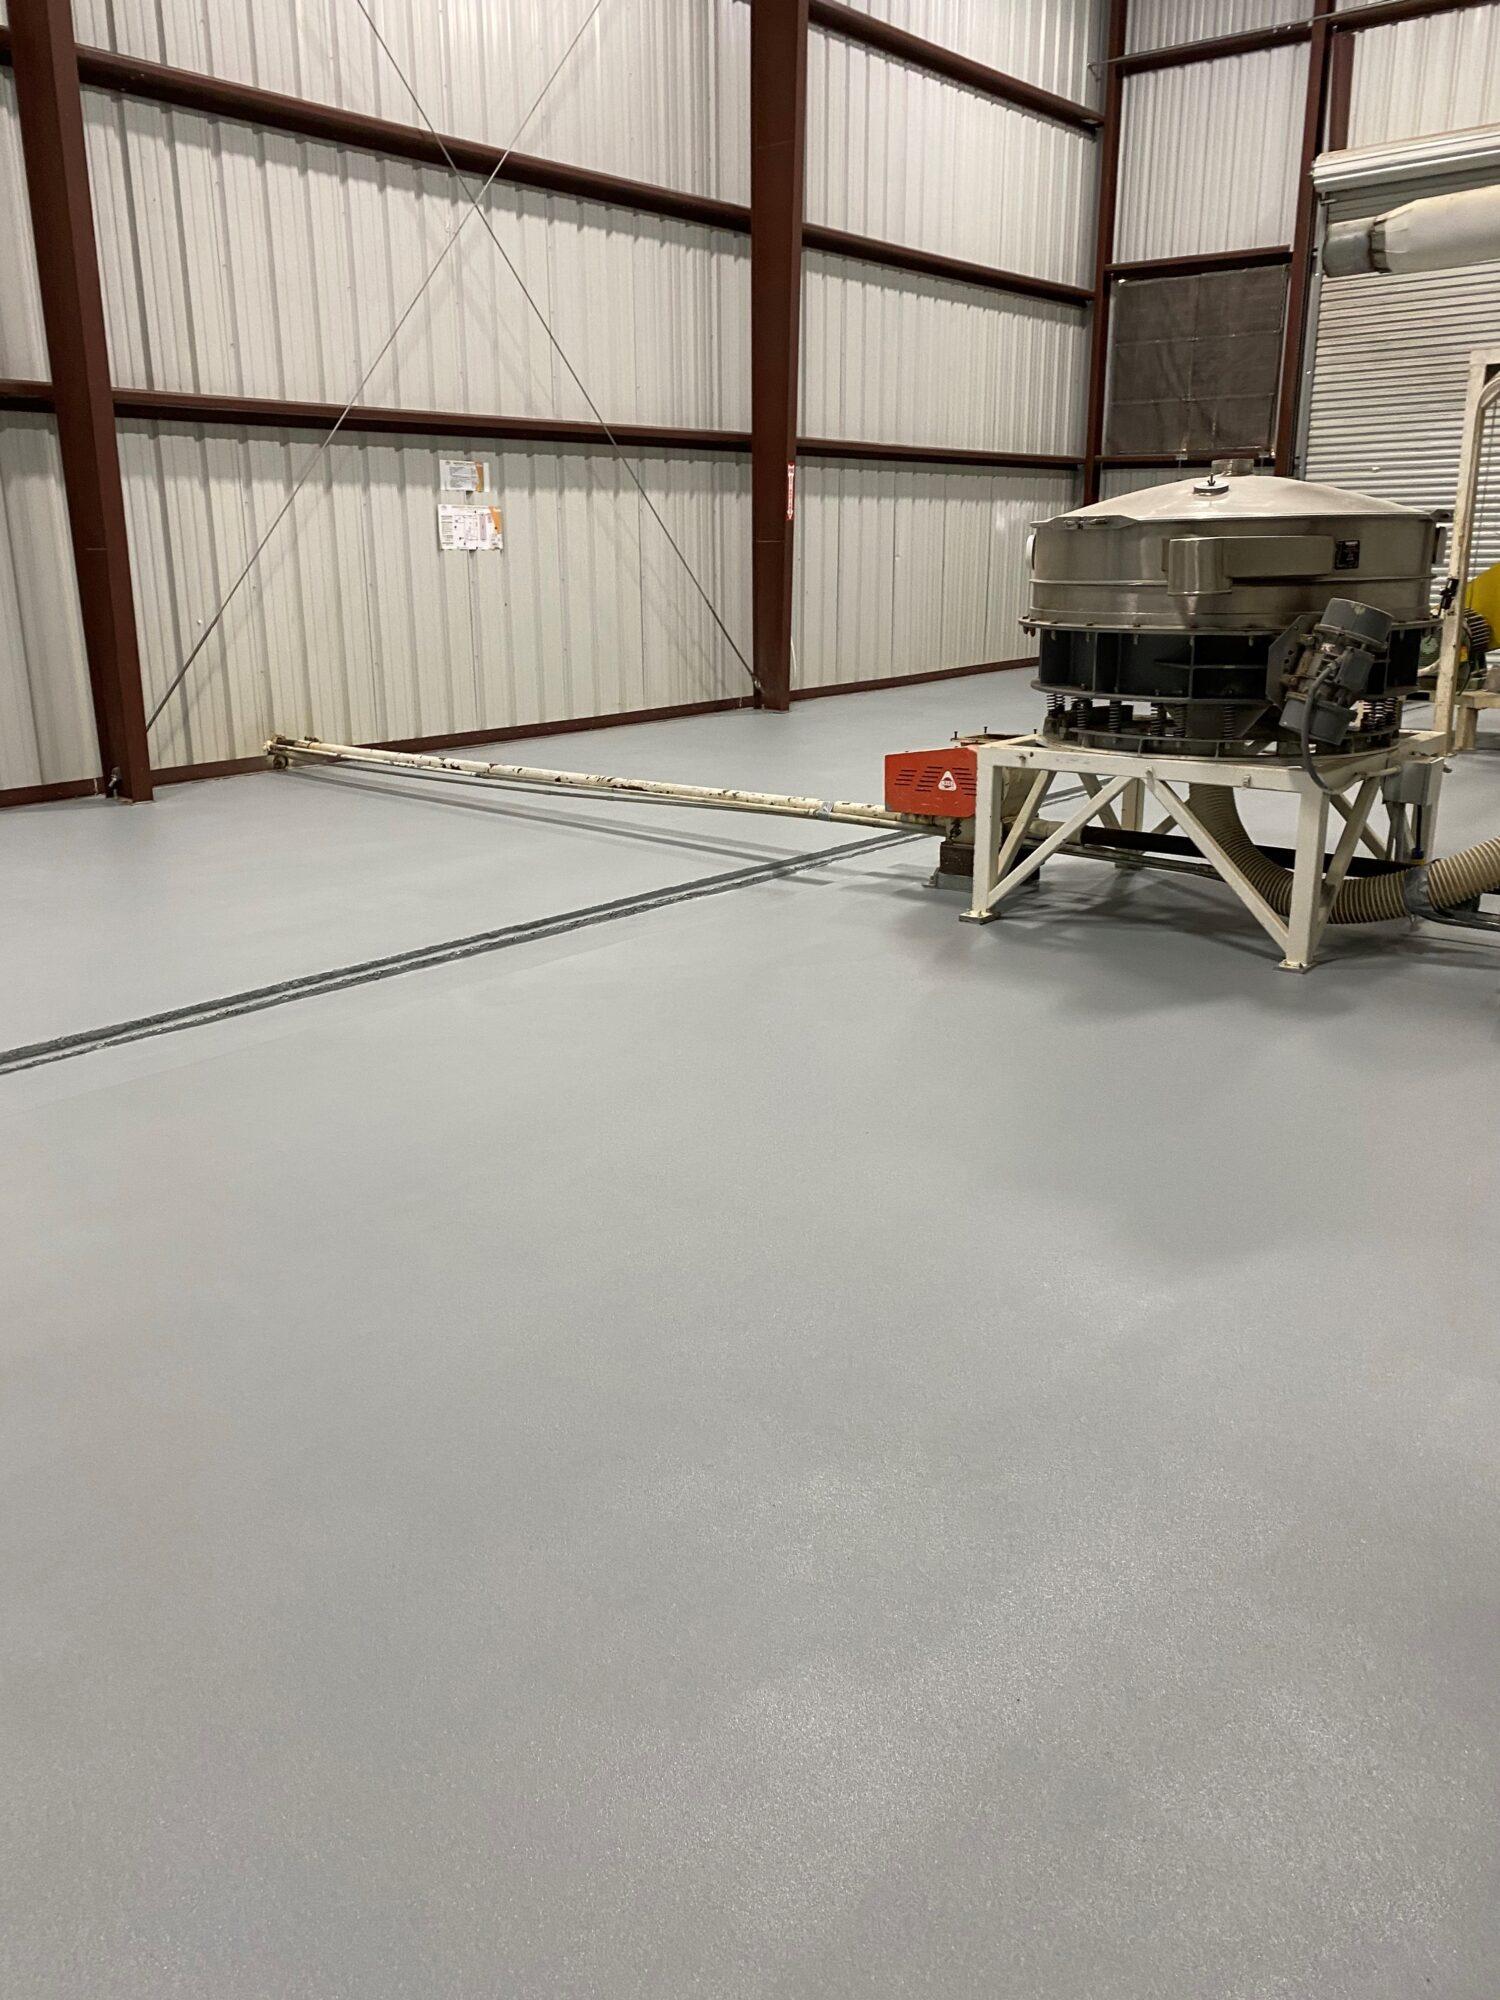 Concrete floor resurfacing, flooring contractors Wynne AR, urethane mortar, manufacturing flooring, industrial flooring, TeamIA, Industrial Applications Inc.